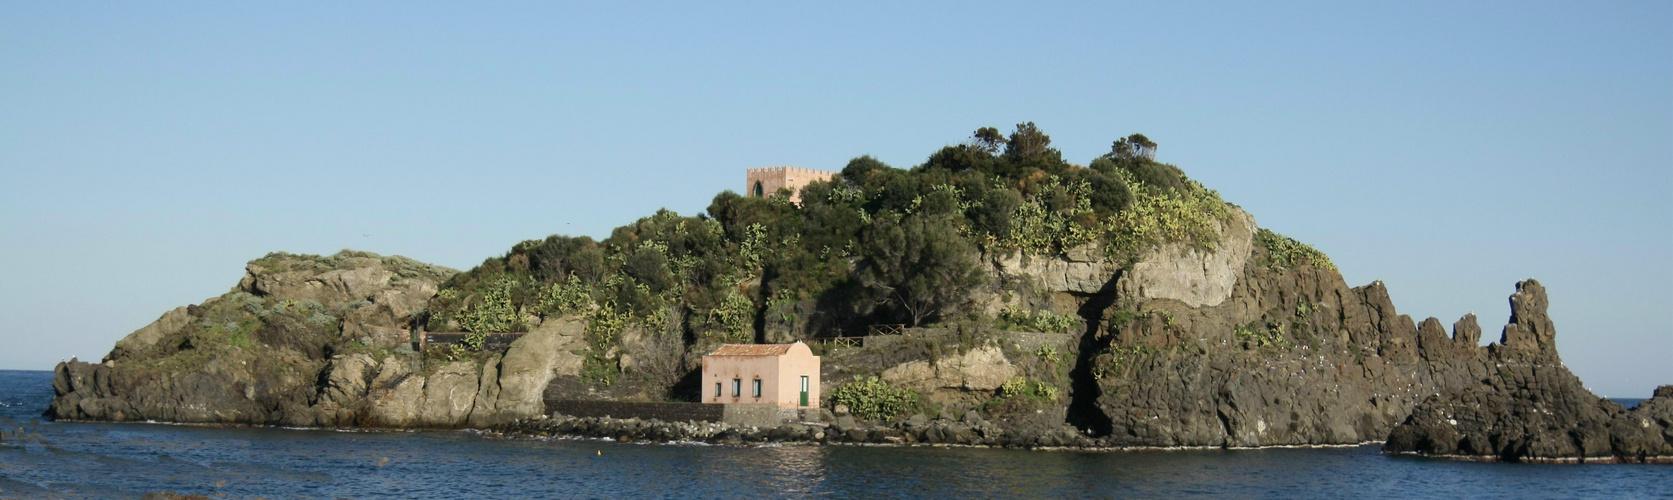 isola lachea (acitrezza)